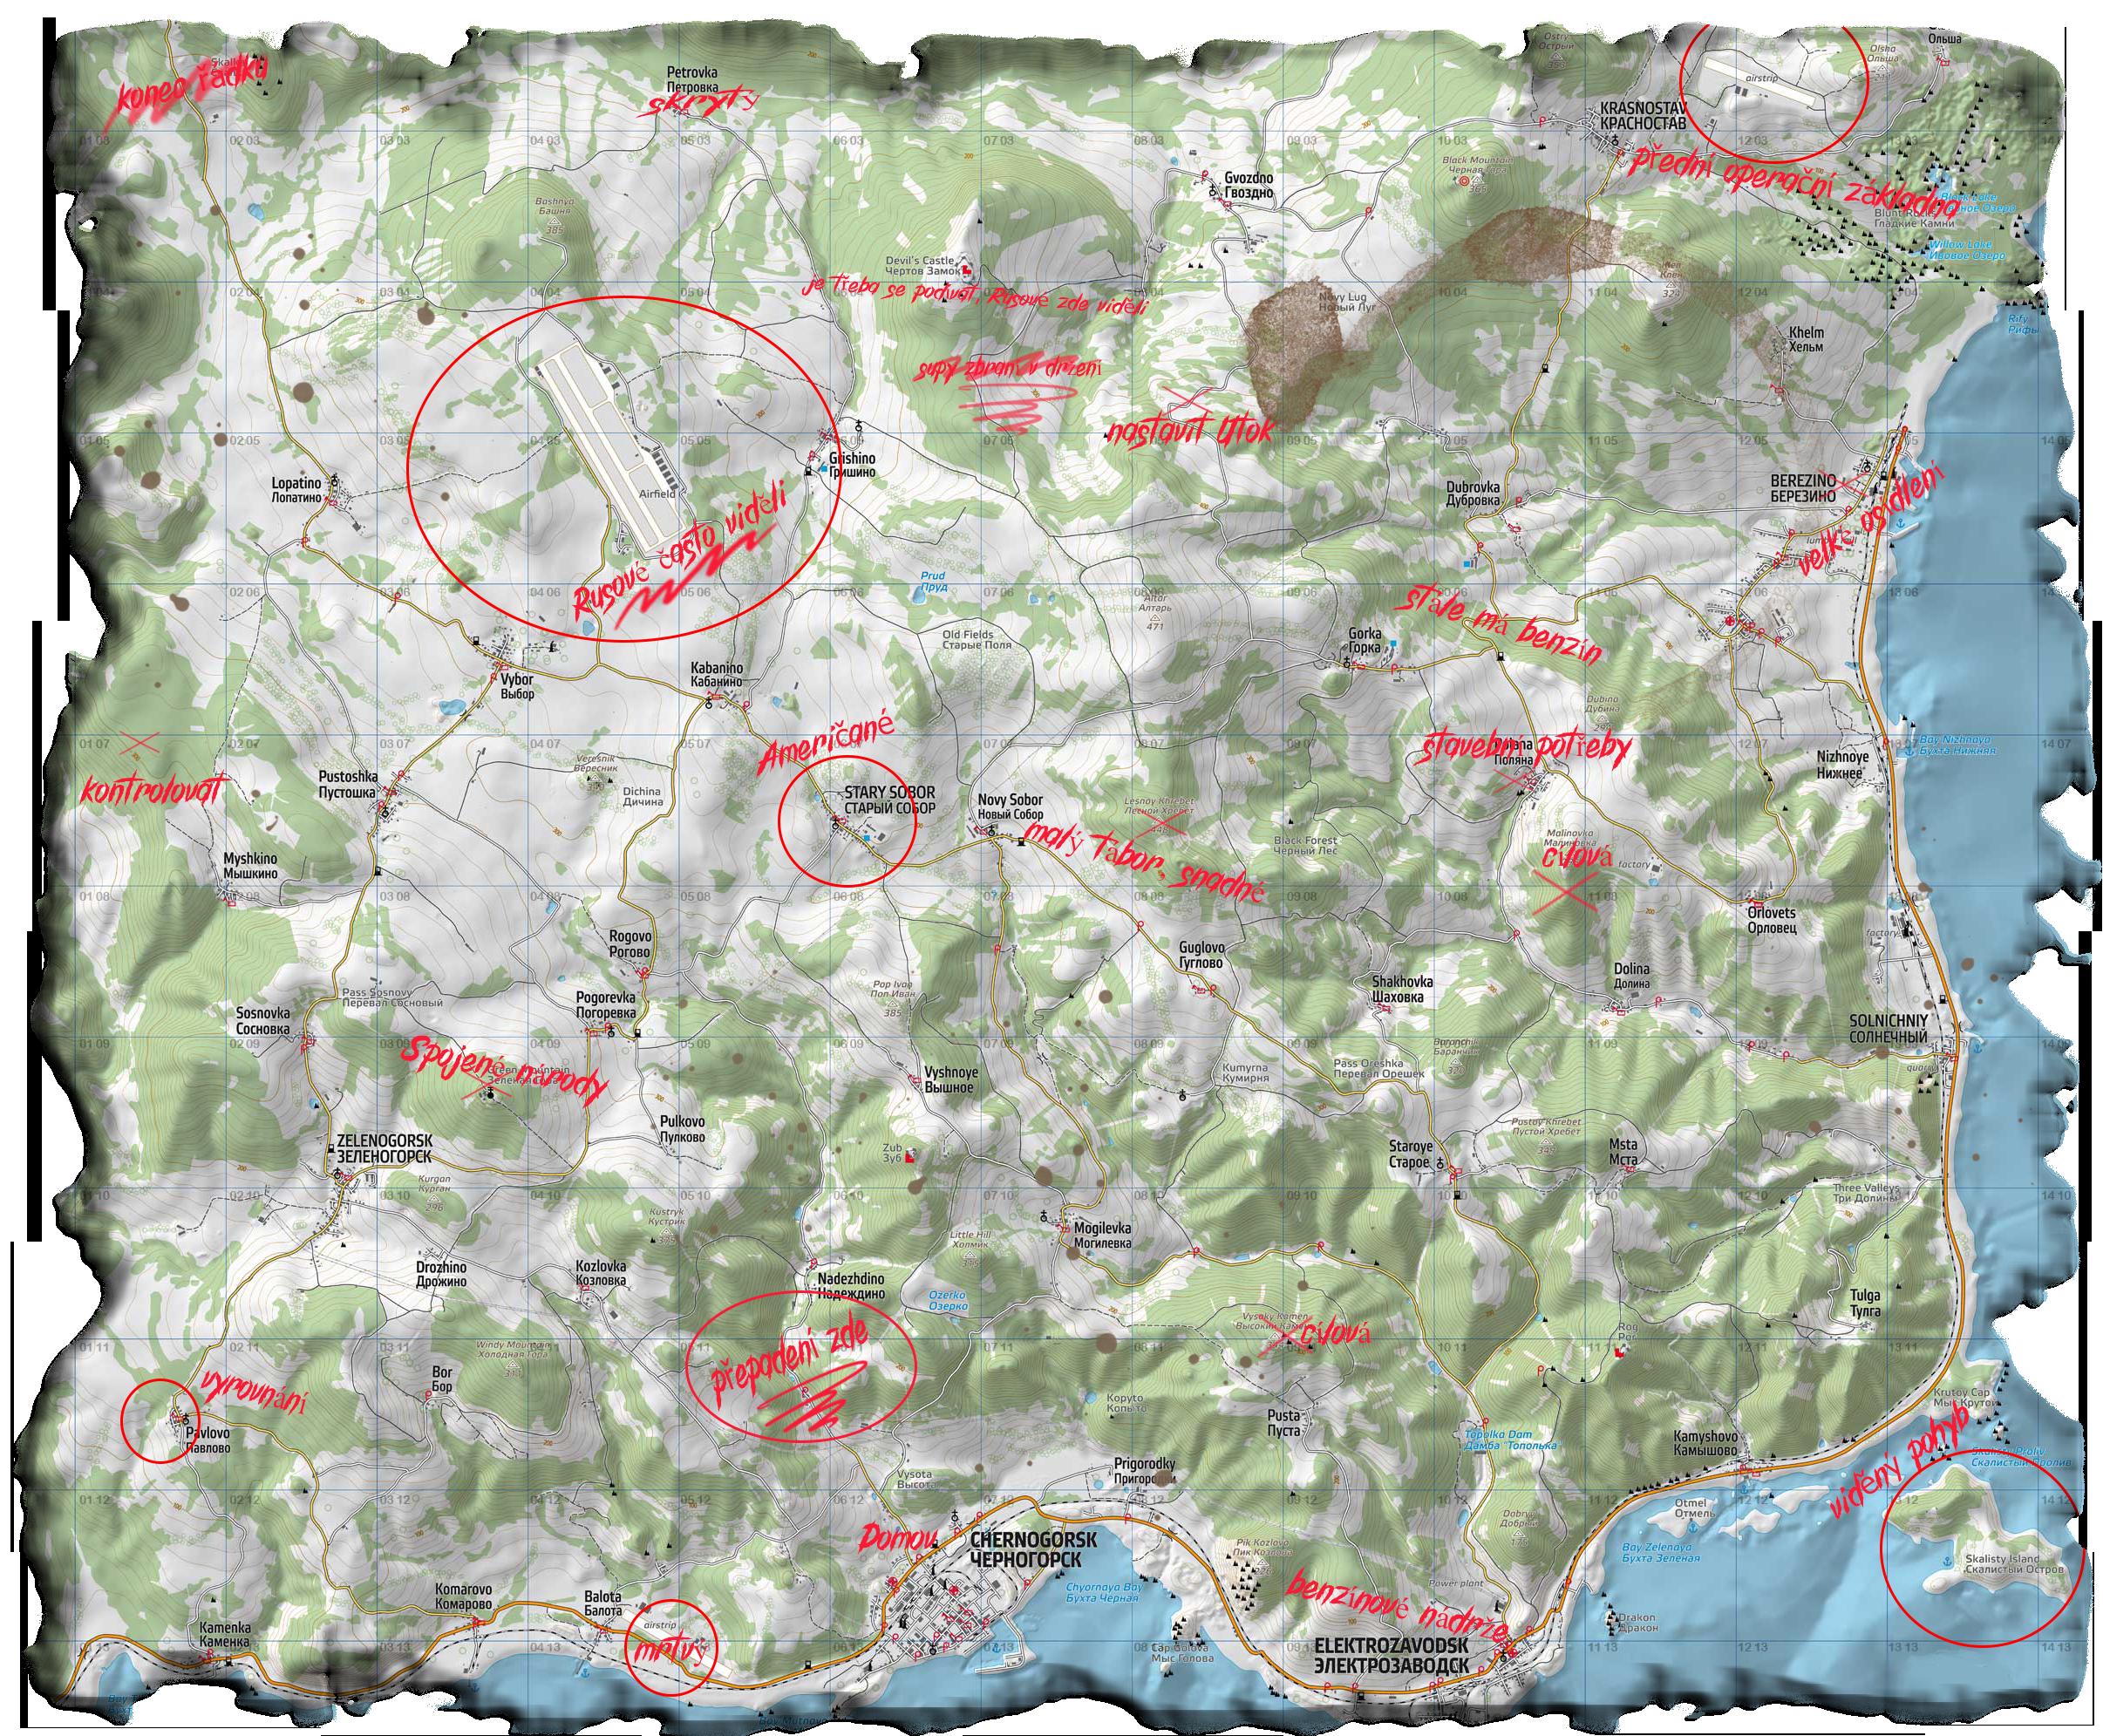 Chernarus-Map_new.png.7181727f45dcc5853b0084aefdb9a259.png.png.cfd5ae8482483bccf15f9dda12a8a0ca.png